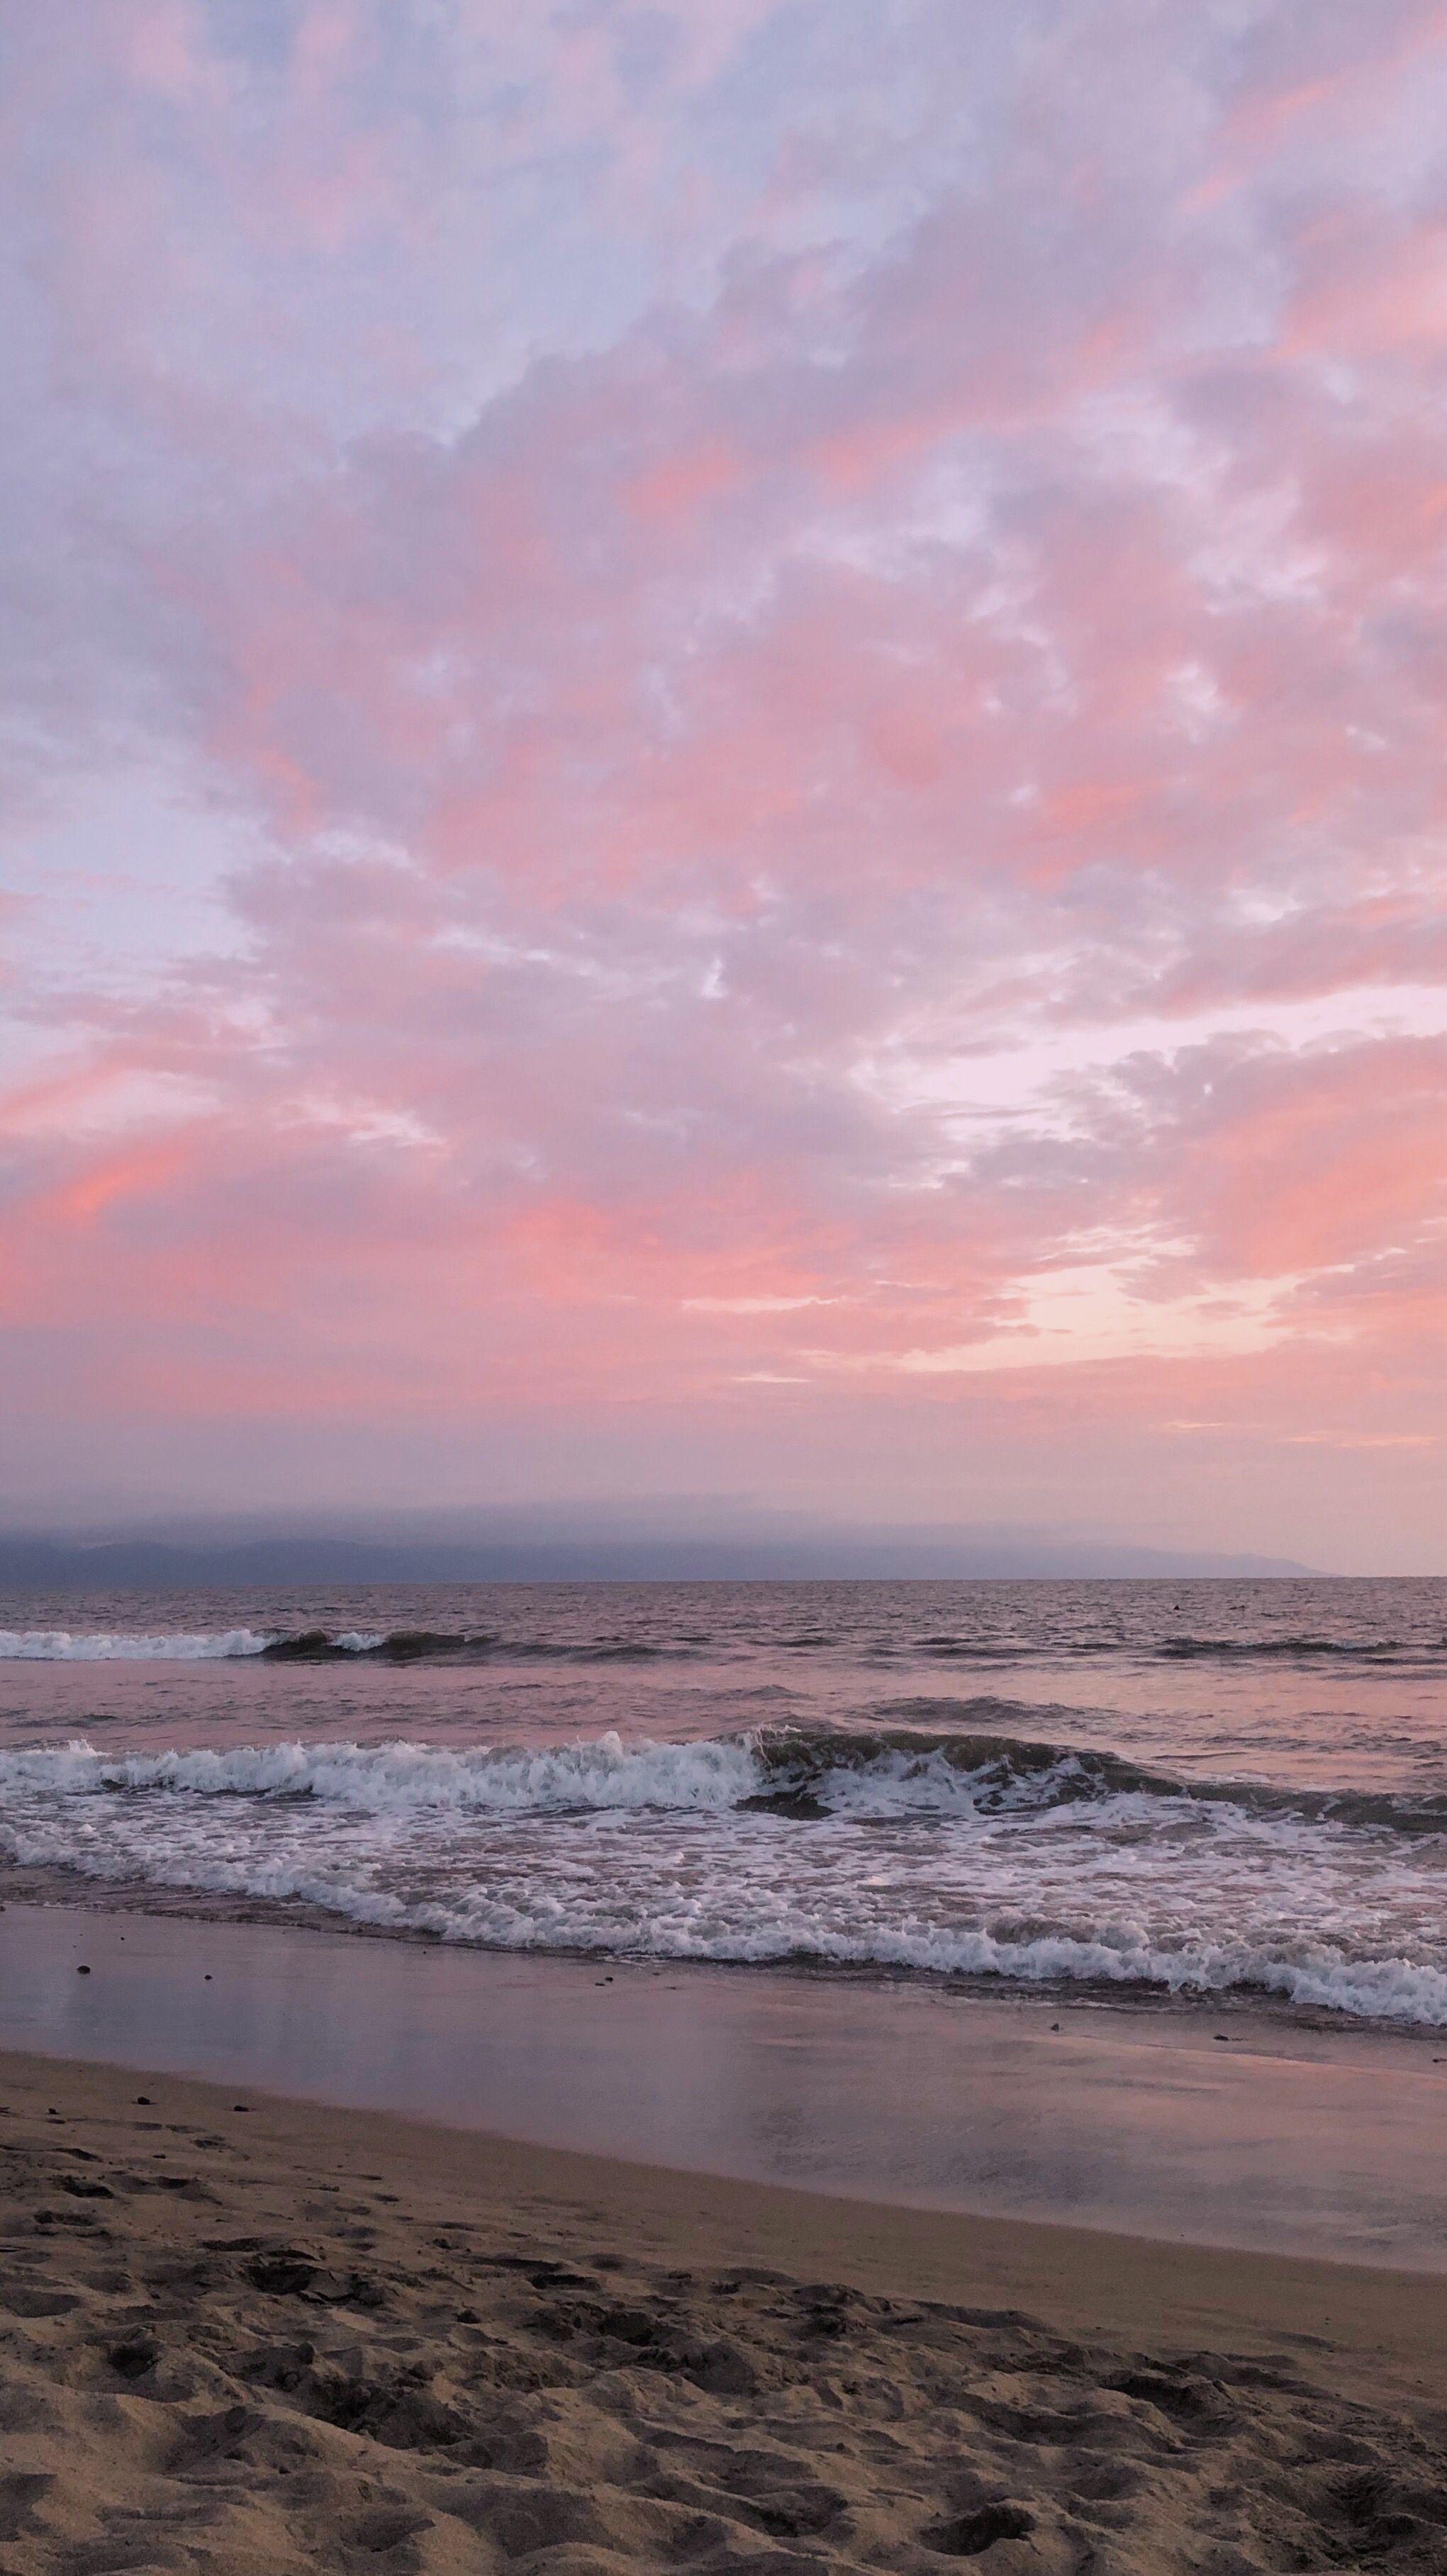 Wallpaper Sunset Wallpaper Beach Wallpaper Beach Wallpaper Iphone